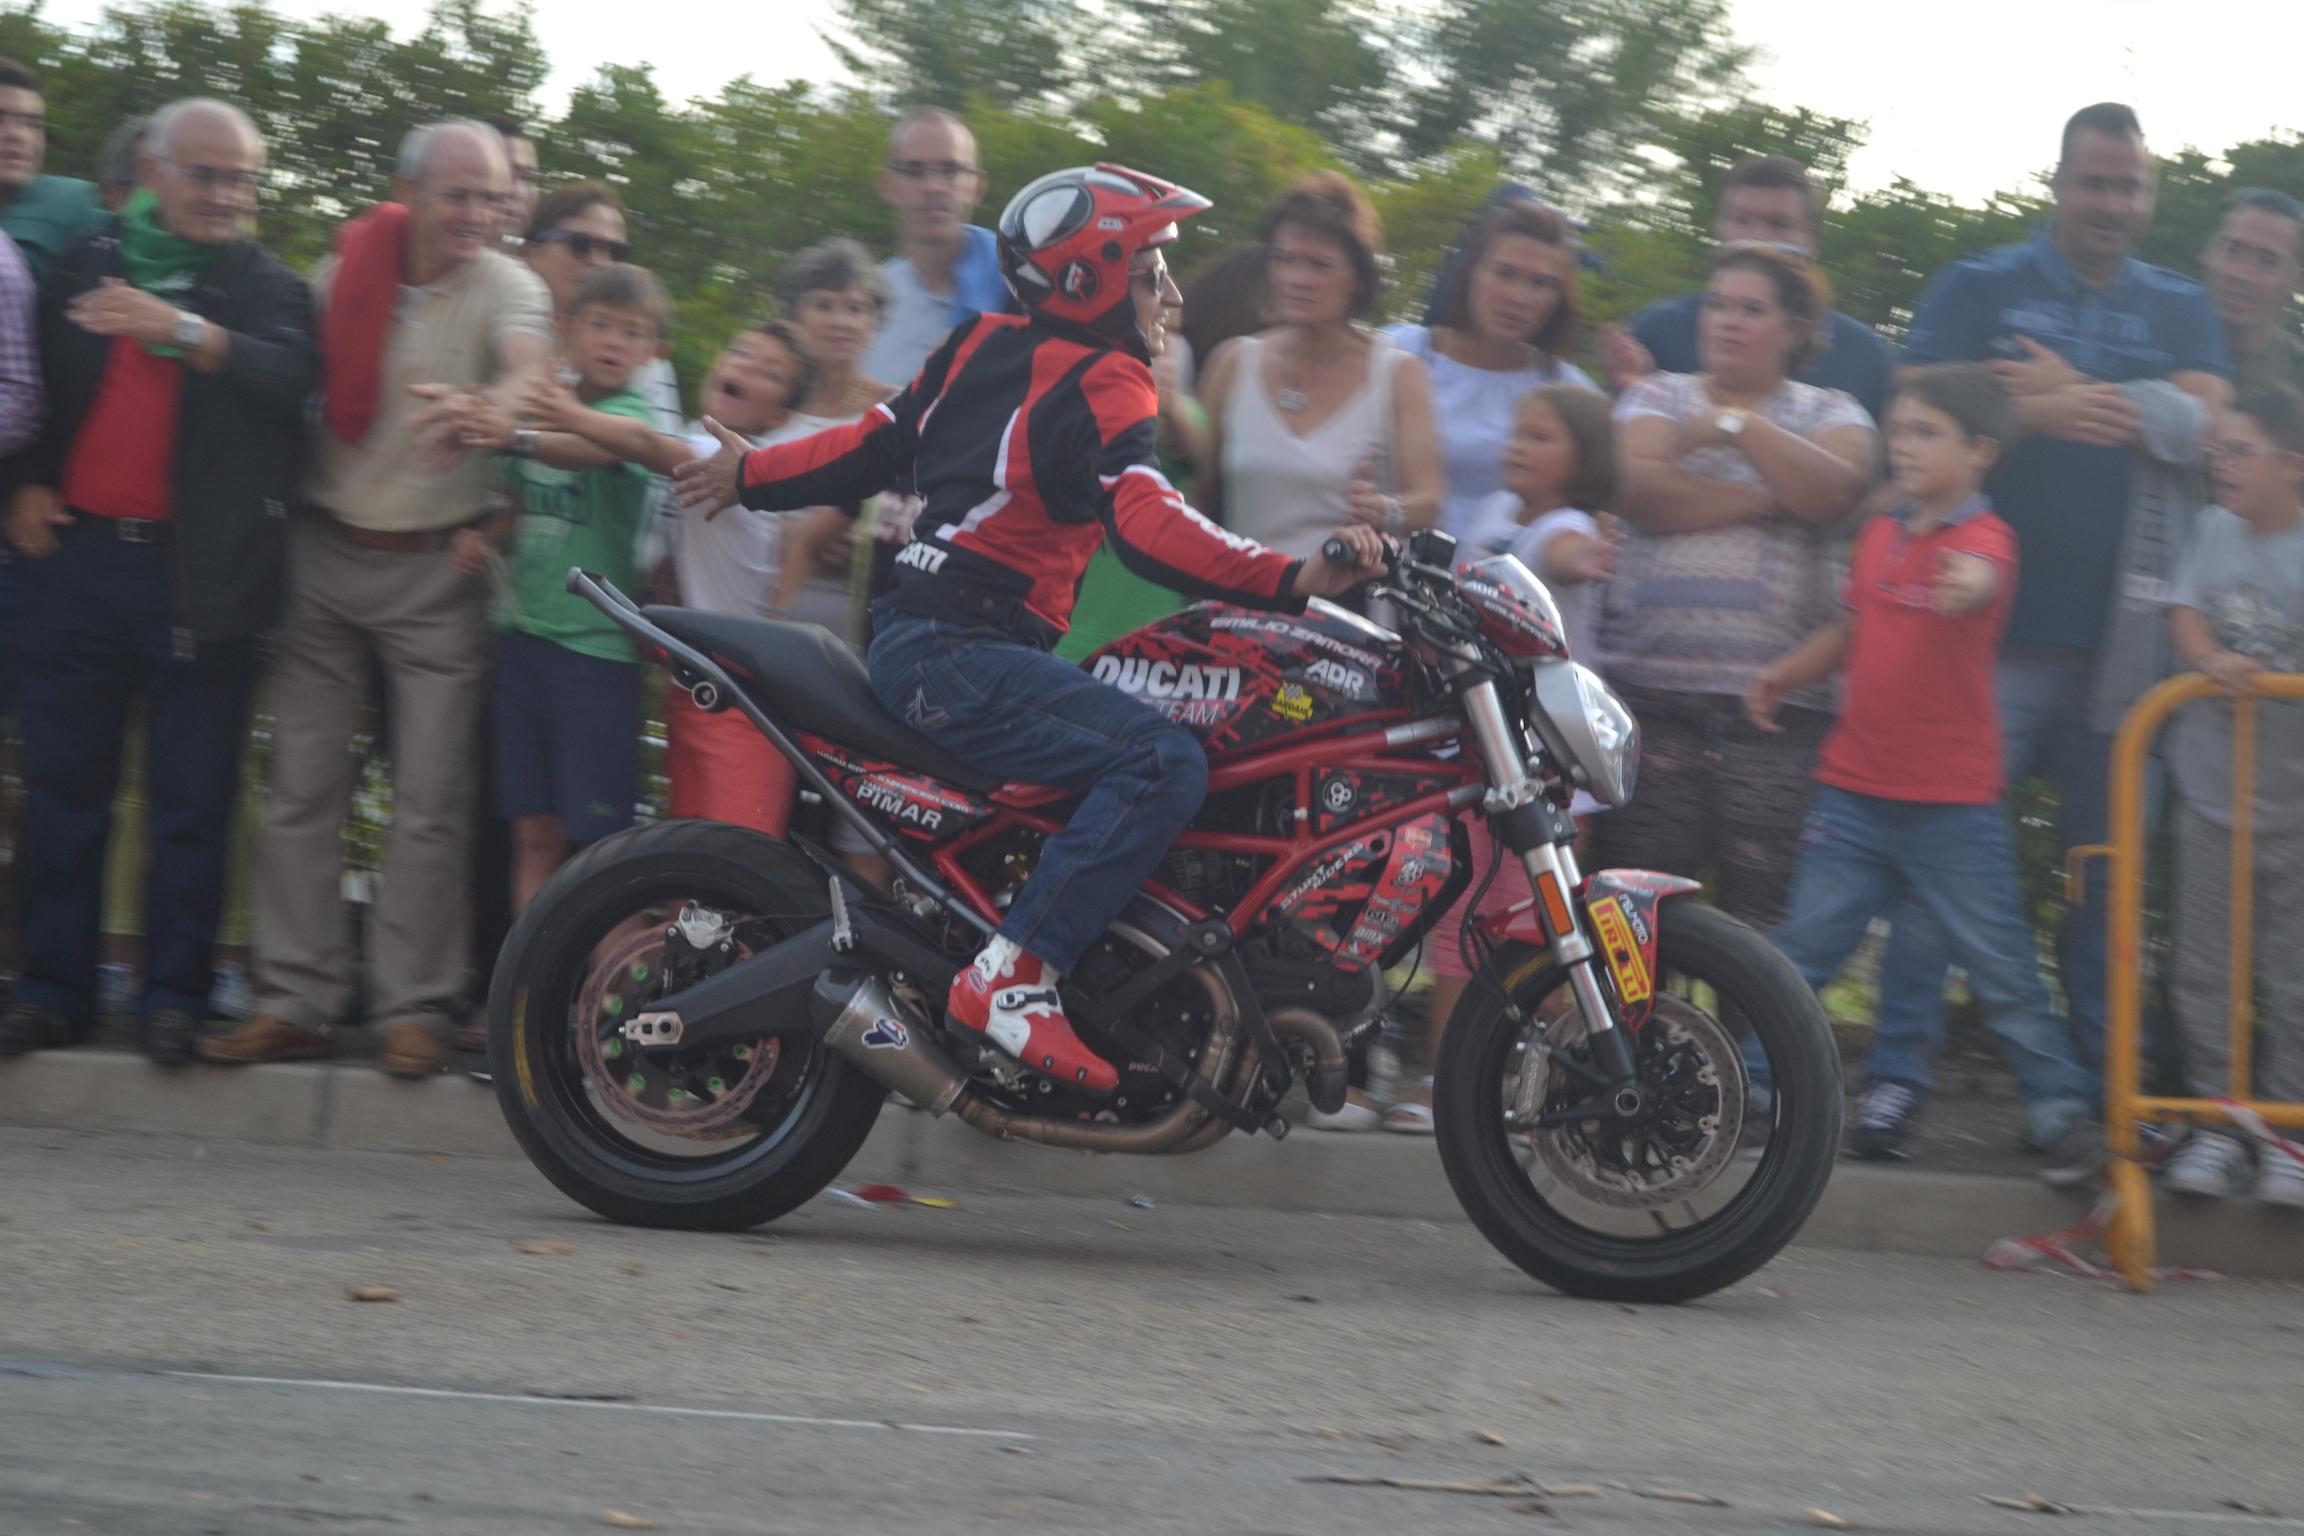 36_SALDAÑA_PALENCIA_EMILIO_ZAMORA_DUCATI_STUNT_TEAM_MOTOR_SOHW_ESPECTACULO_MOTOCICLISMO_EXHIBICION_2017_MONSTER_CABALLITO_WHEELIE_INVERTIDO_DRIFT_QUAD